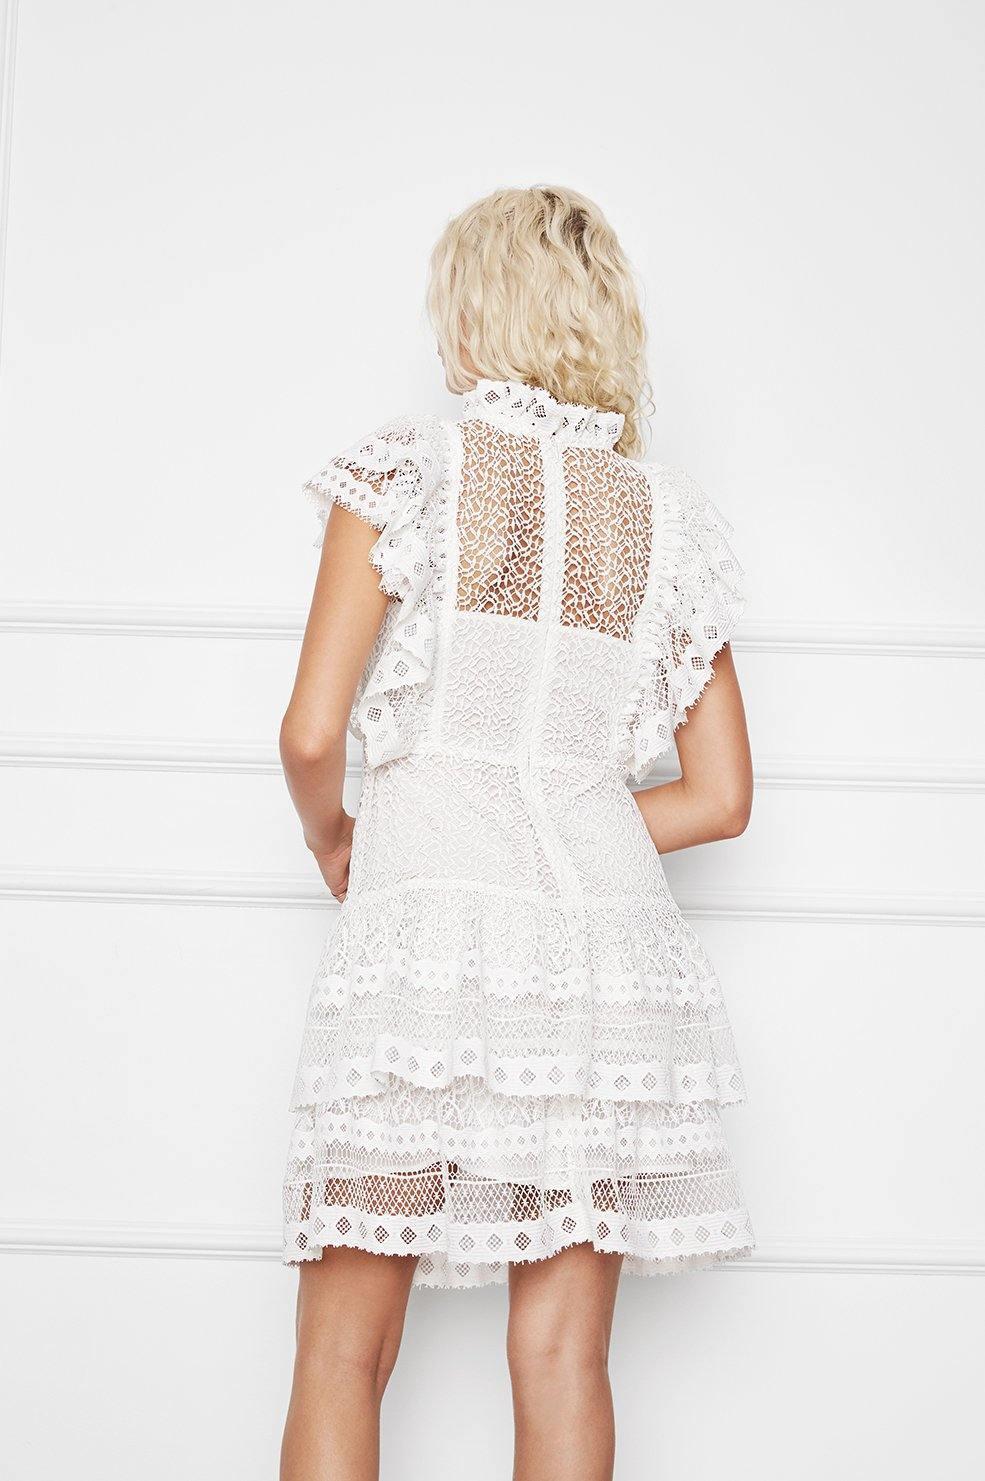 ANINE-BING-PENELOPE-DRESS-WHITE-AB21-038-01_1375-1.jpg